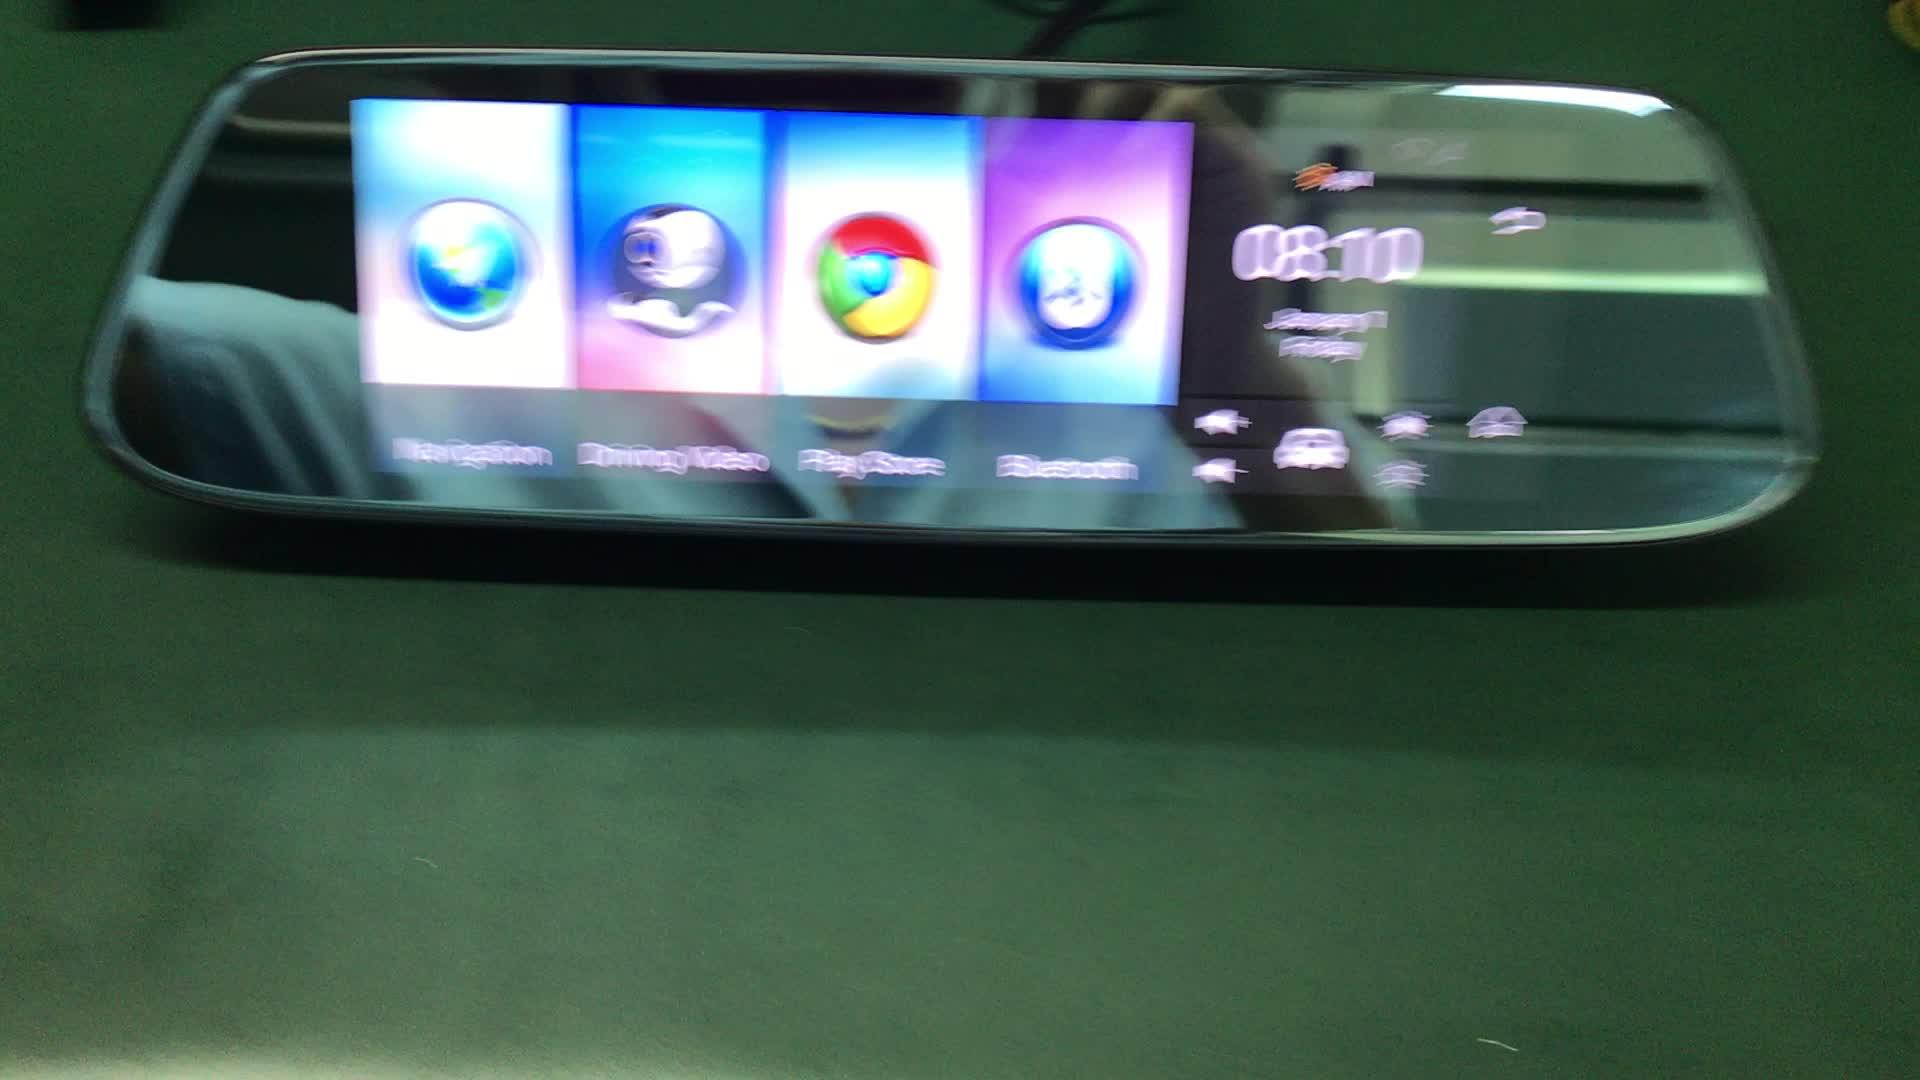 Fhd 1080 p 8 inch rückspiegel android GPS navigation dual-kamera auto dvr 4G auto